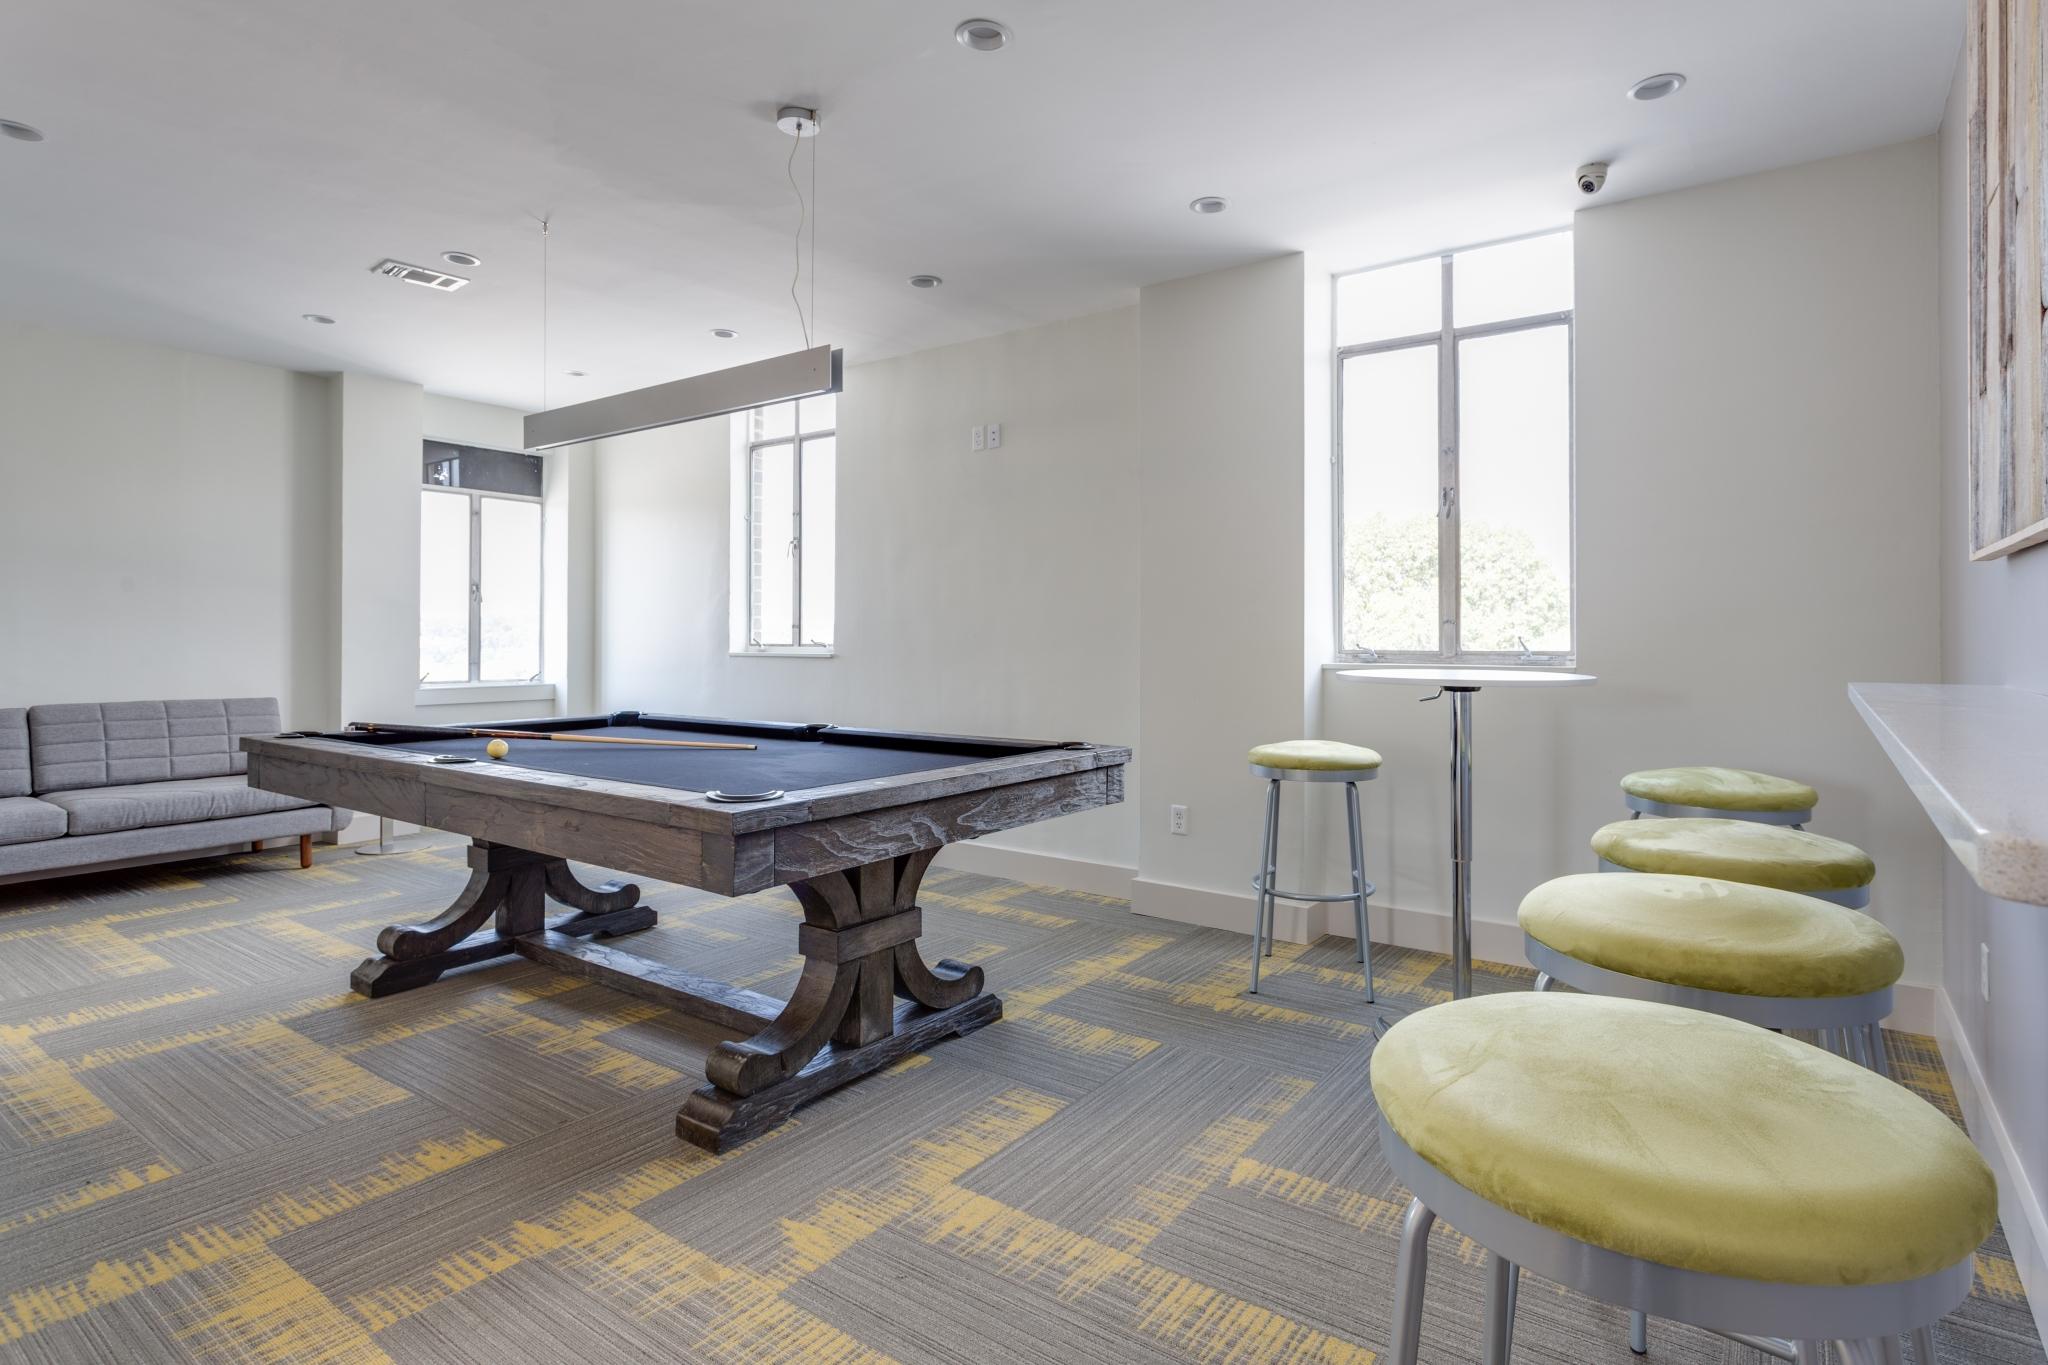 Game room at Park East Apartments in Adams Morgan